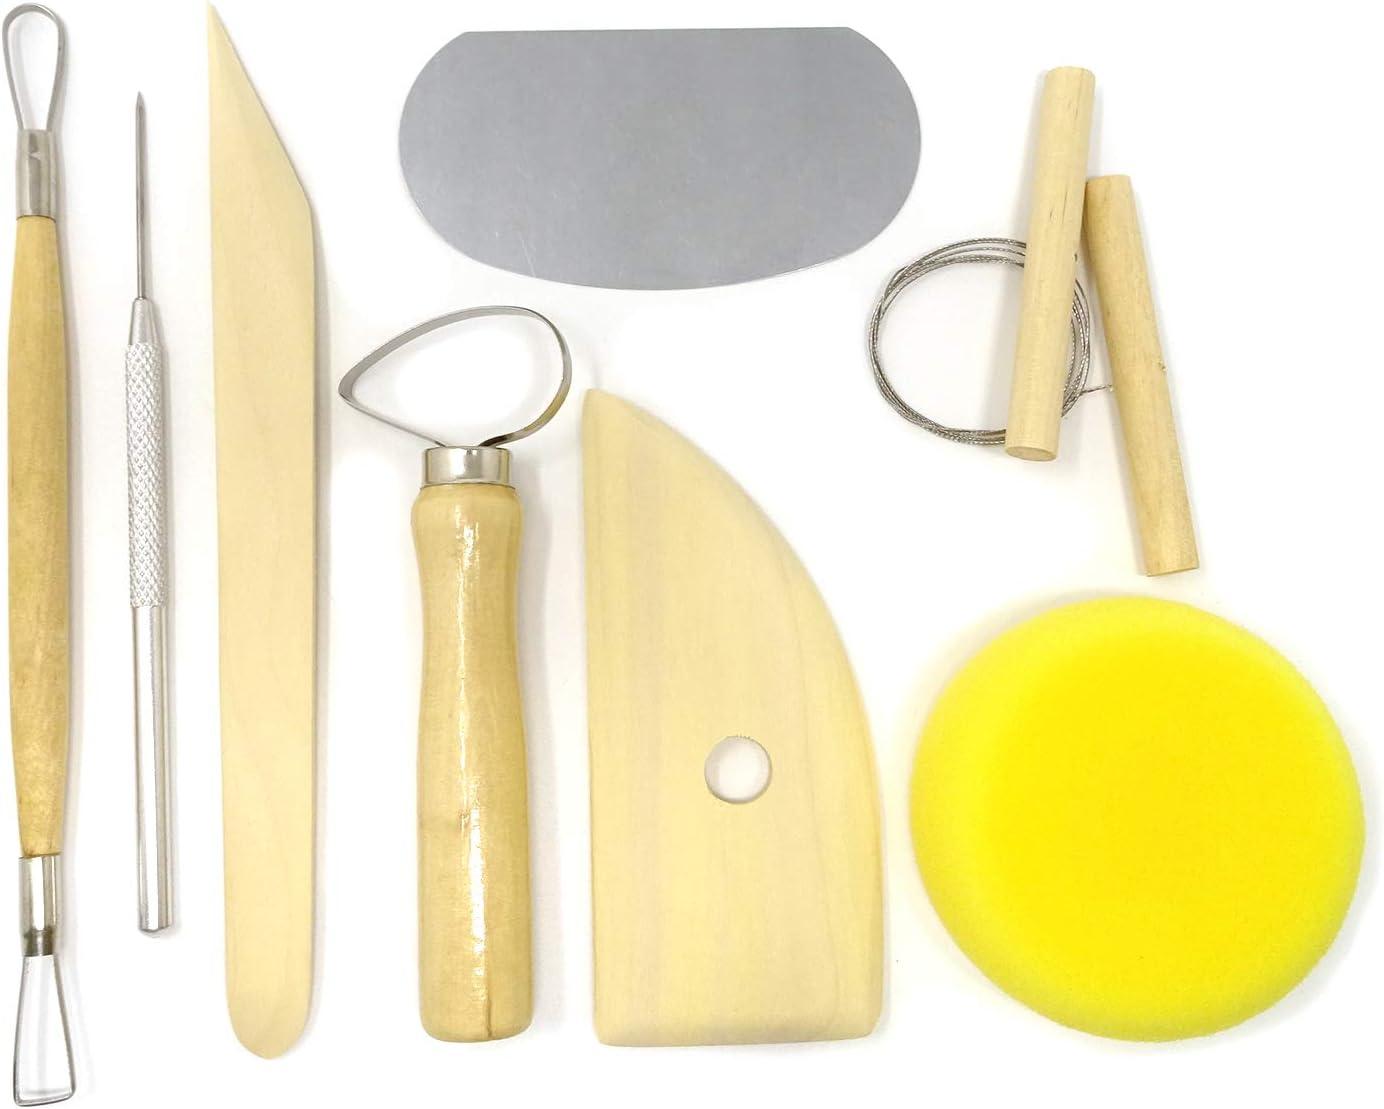 8Pcs Set Clay Wax Pottery Tool Kit Ceramics Wax Carving Sculpting Moldeling Tool